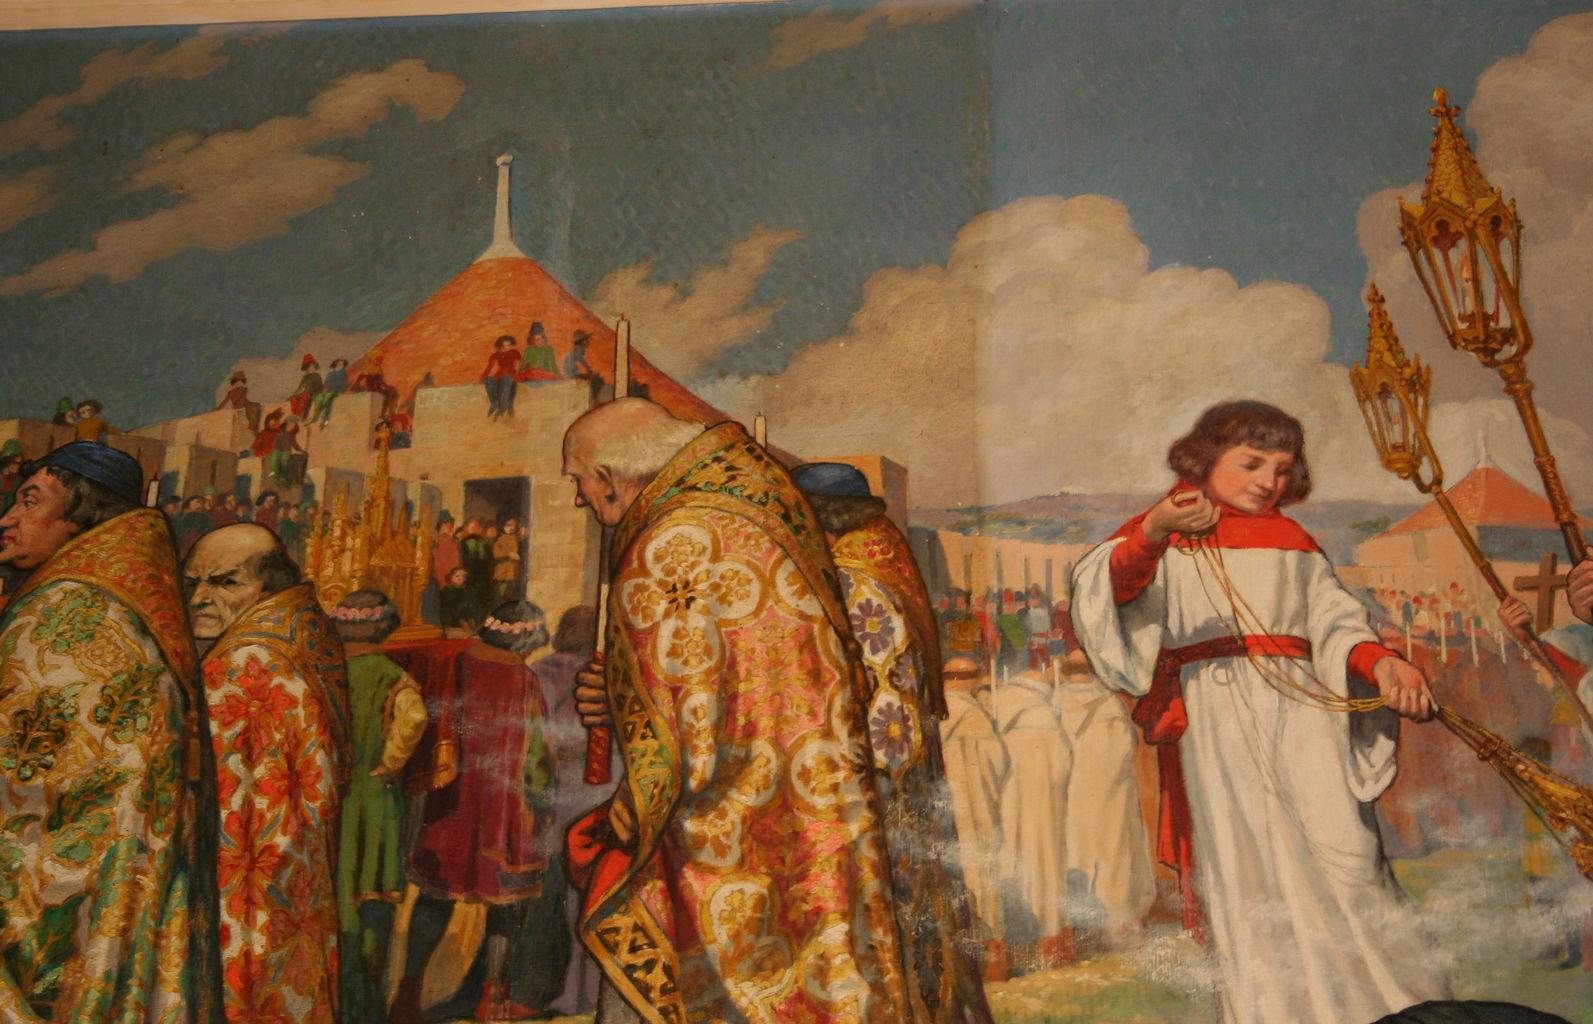 Nettoyer Un Vieux Tableau alla avdonina legoux - peintures   wix